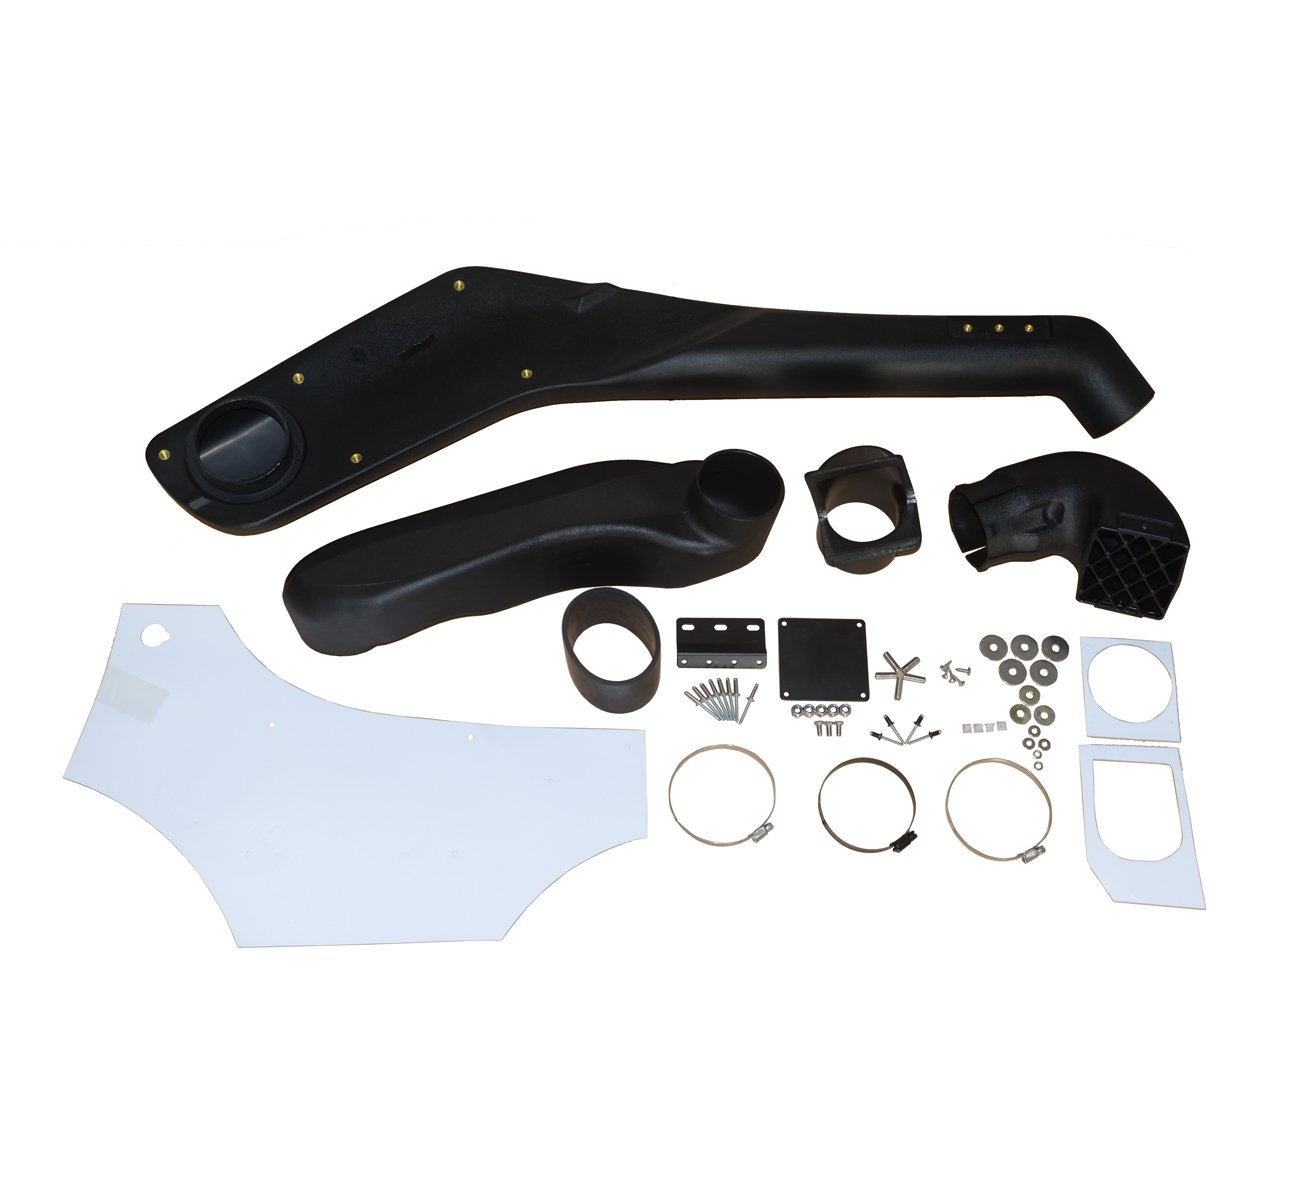 For Jeep Wrangler BlackPath Silver Grand Cherokee Throttle Body Spacer Kit Cherokee T6 Billet